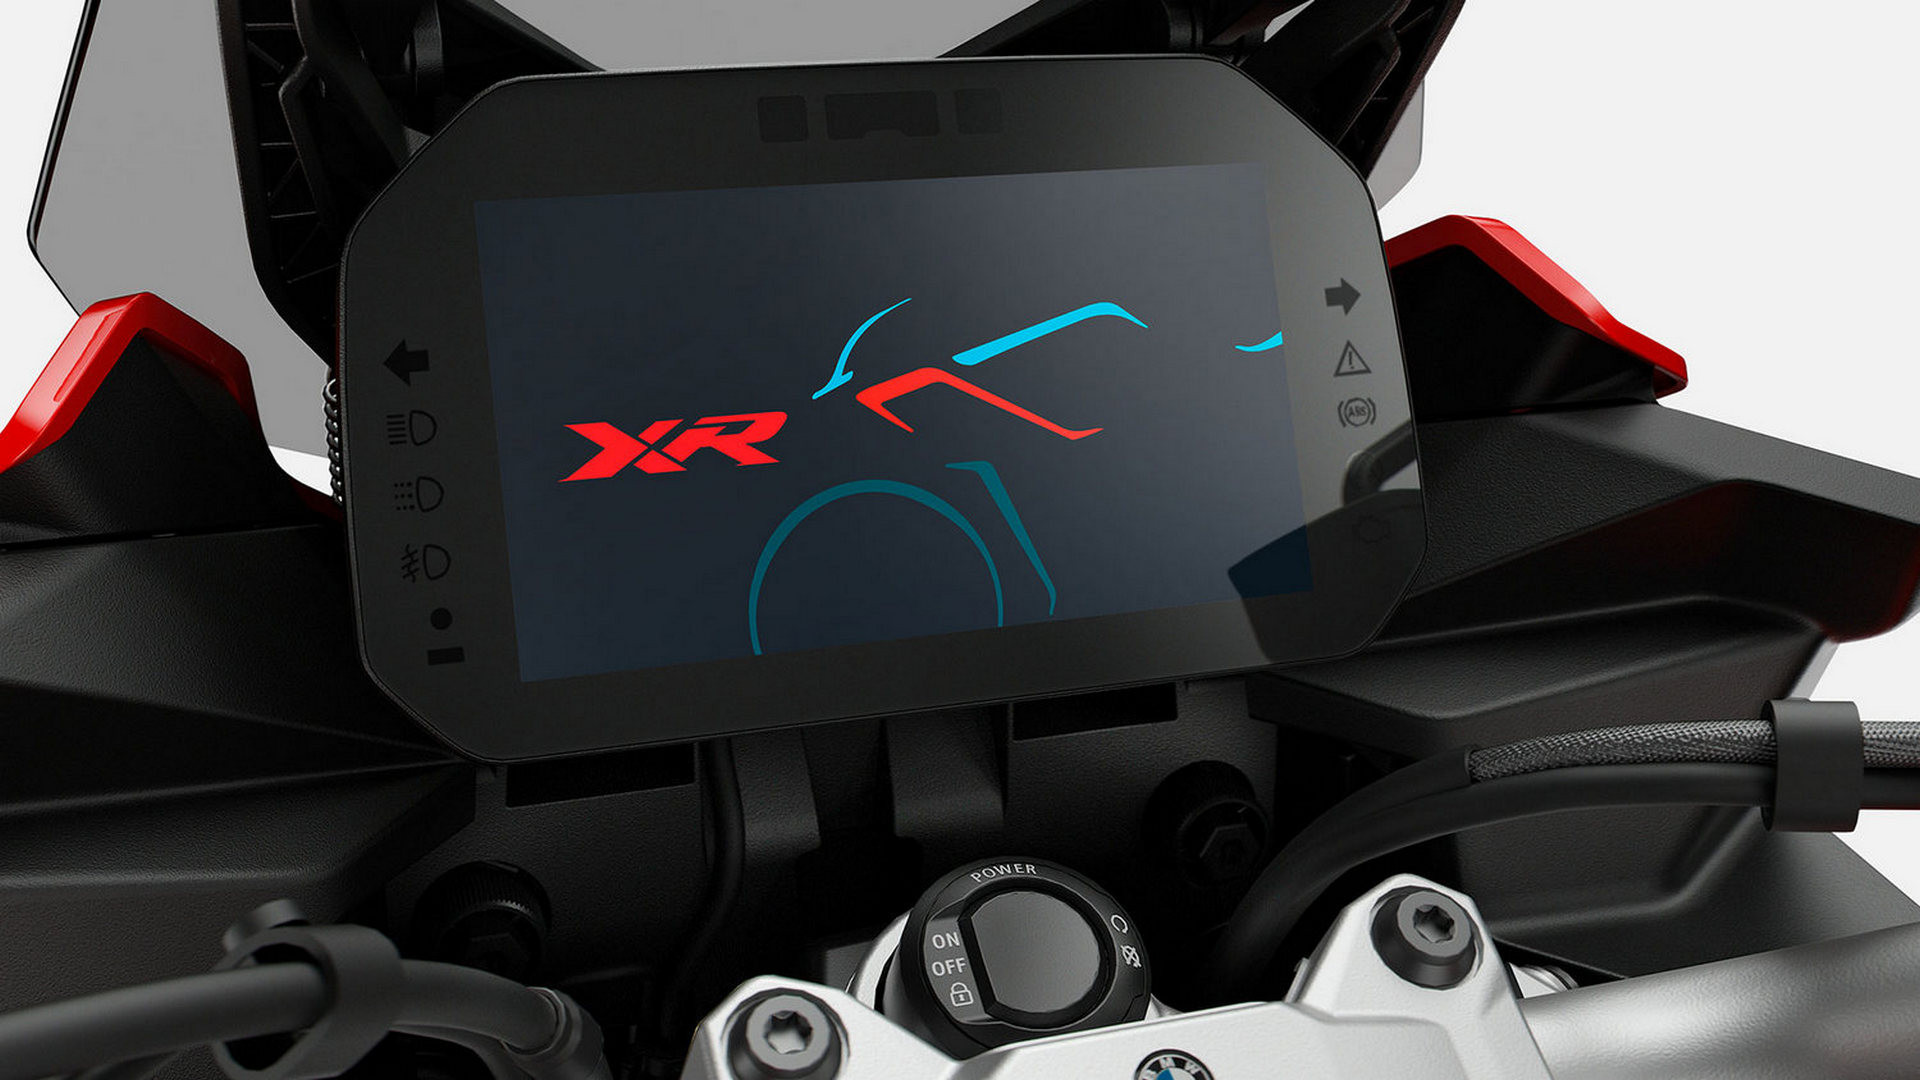 Приладова панель BMW Motorrad Connectivity з TFT-дисплеєм.